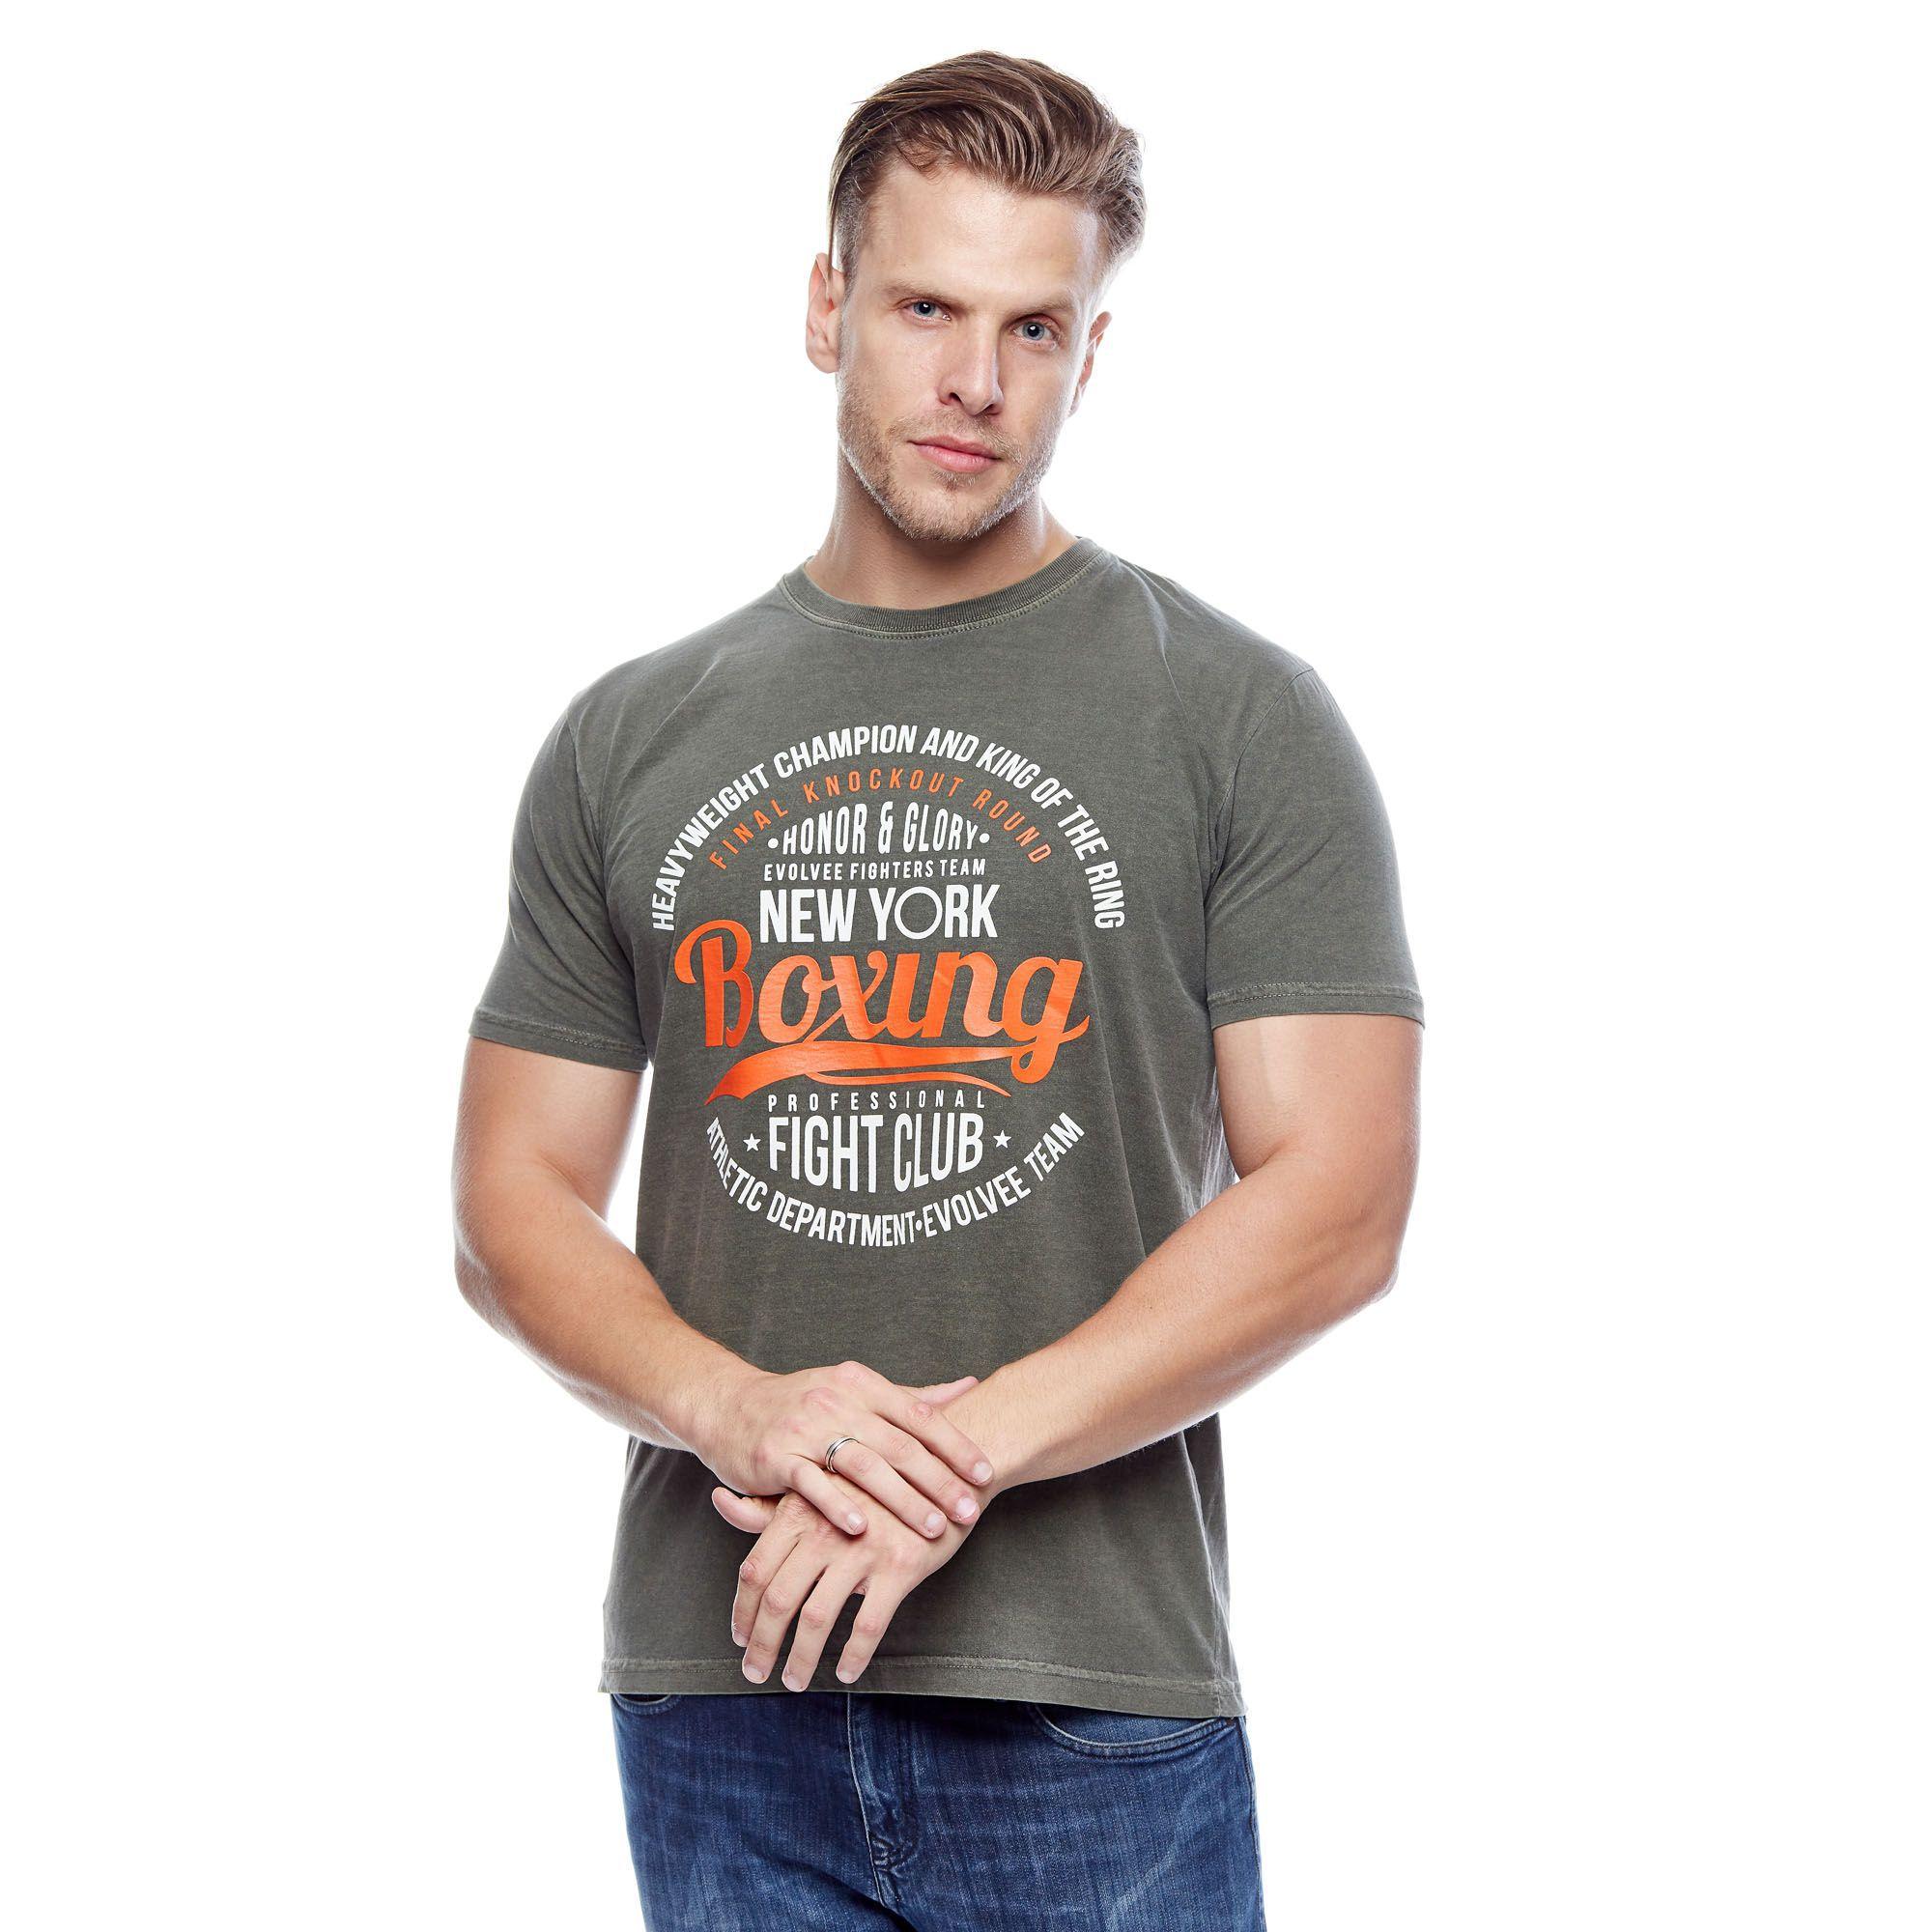 Camiseta Evolvee Honor Boxing Masculina